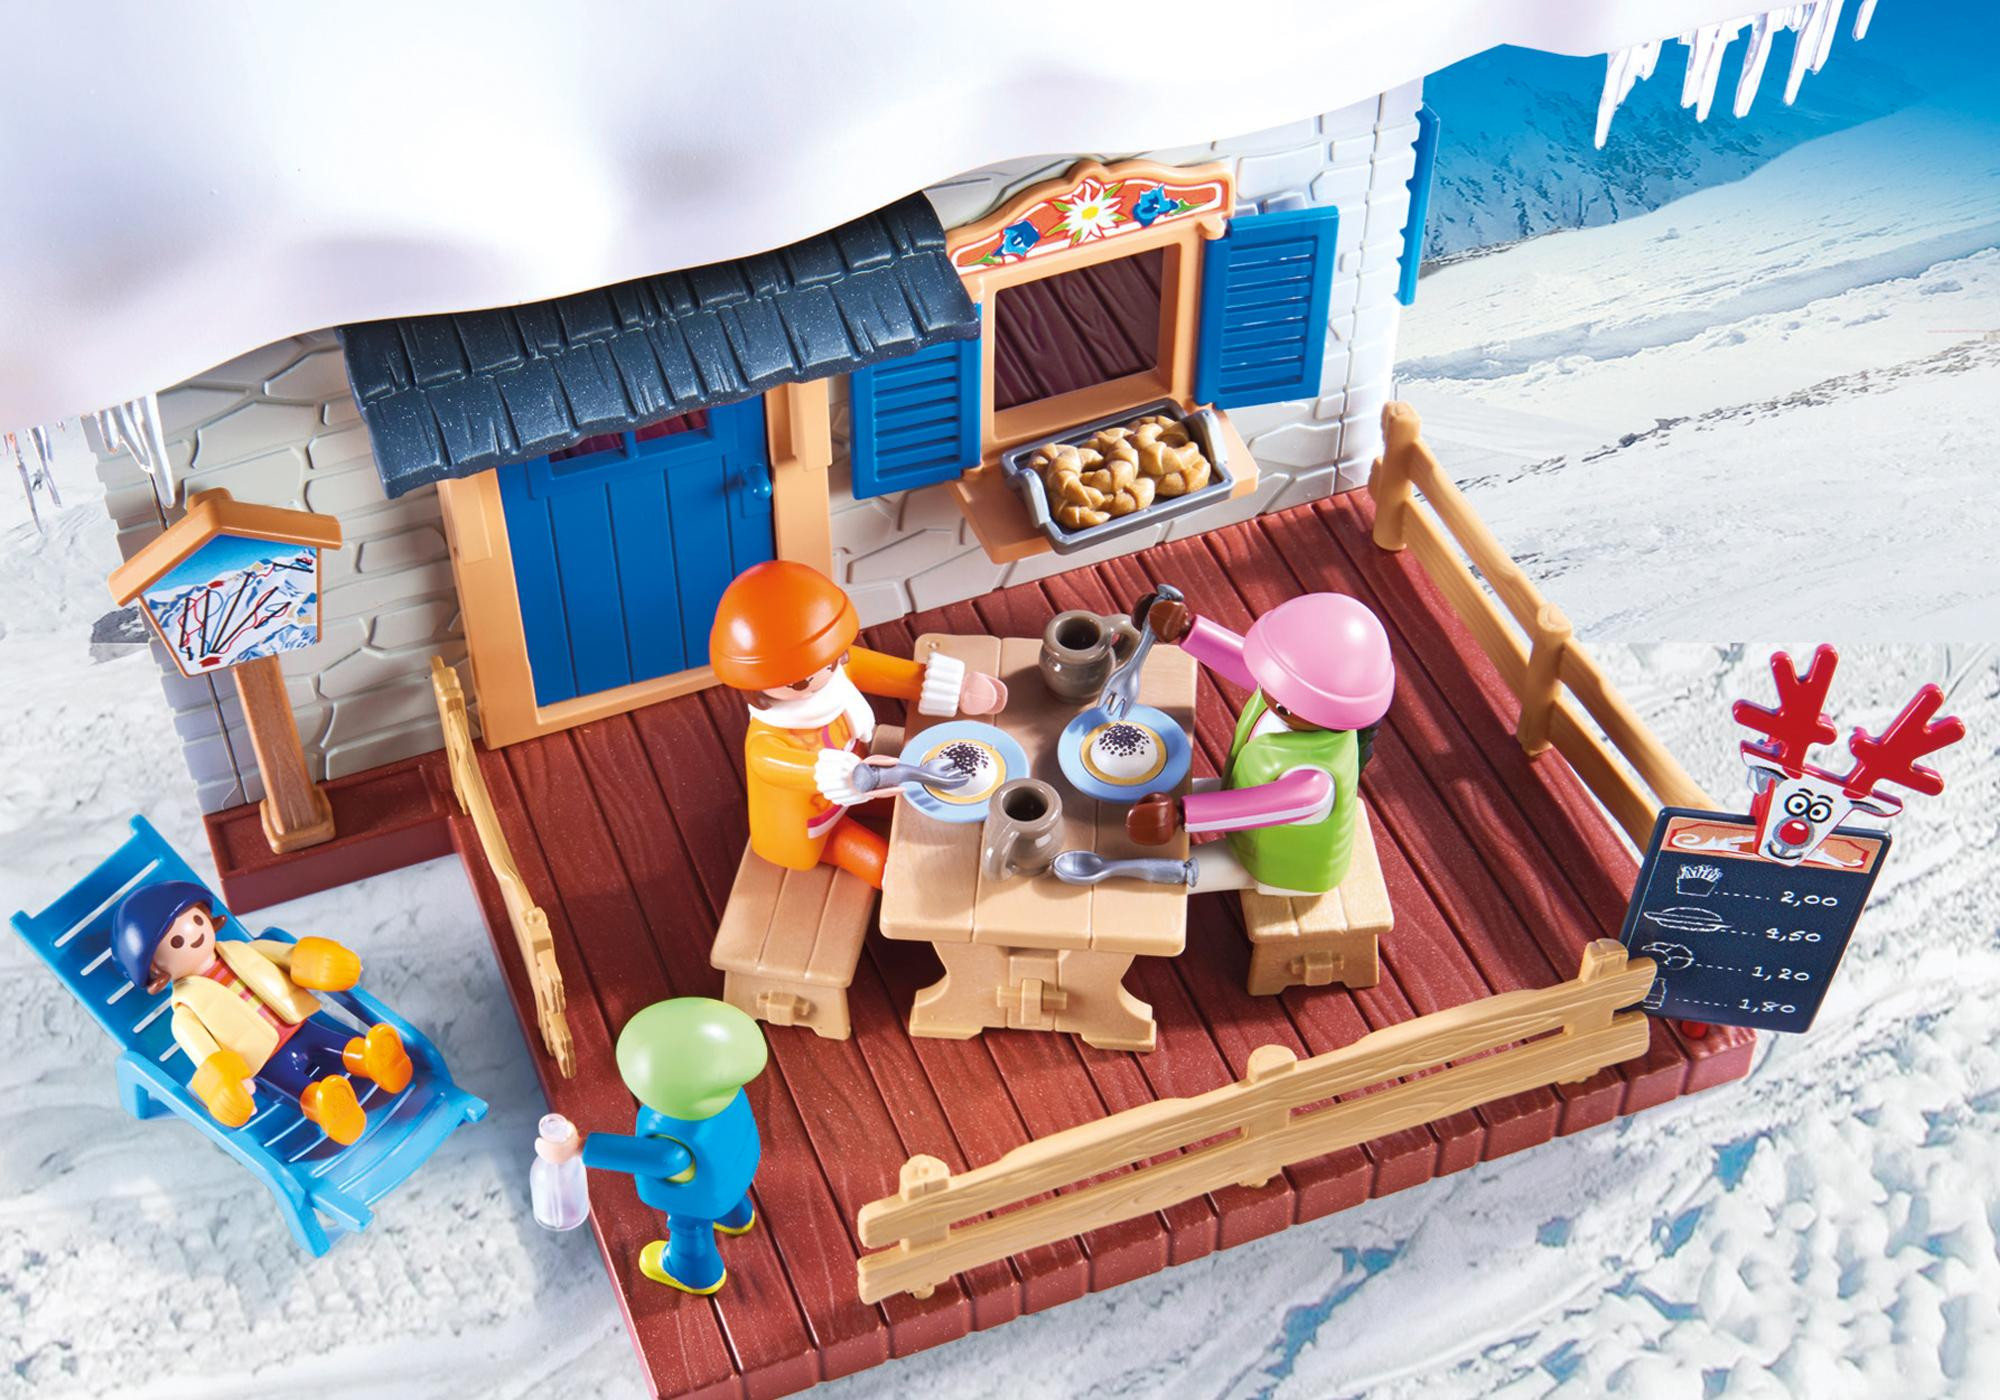 http://media.playmobil.com/i/playmobil/9280_product_extra1/Ski Lodge